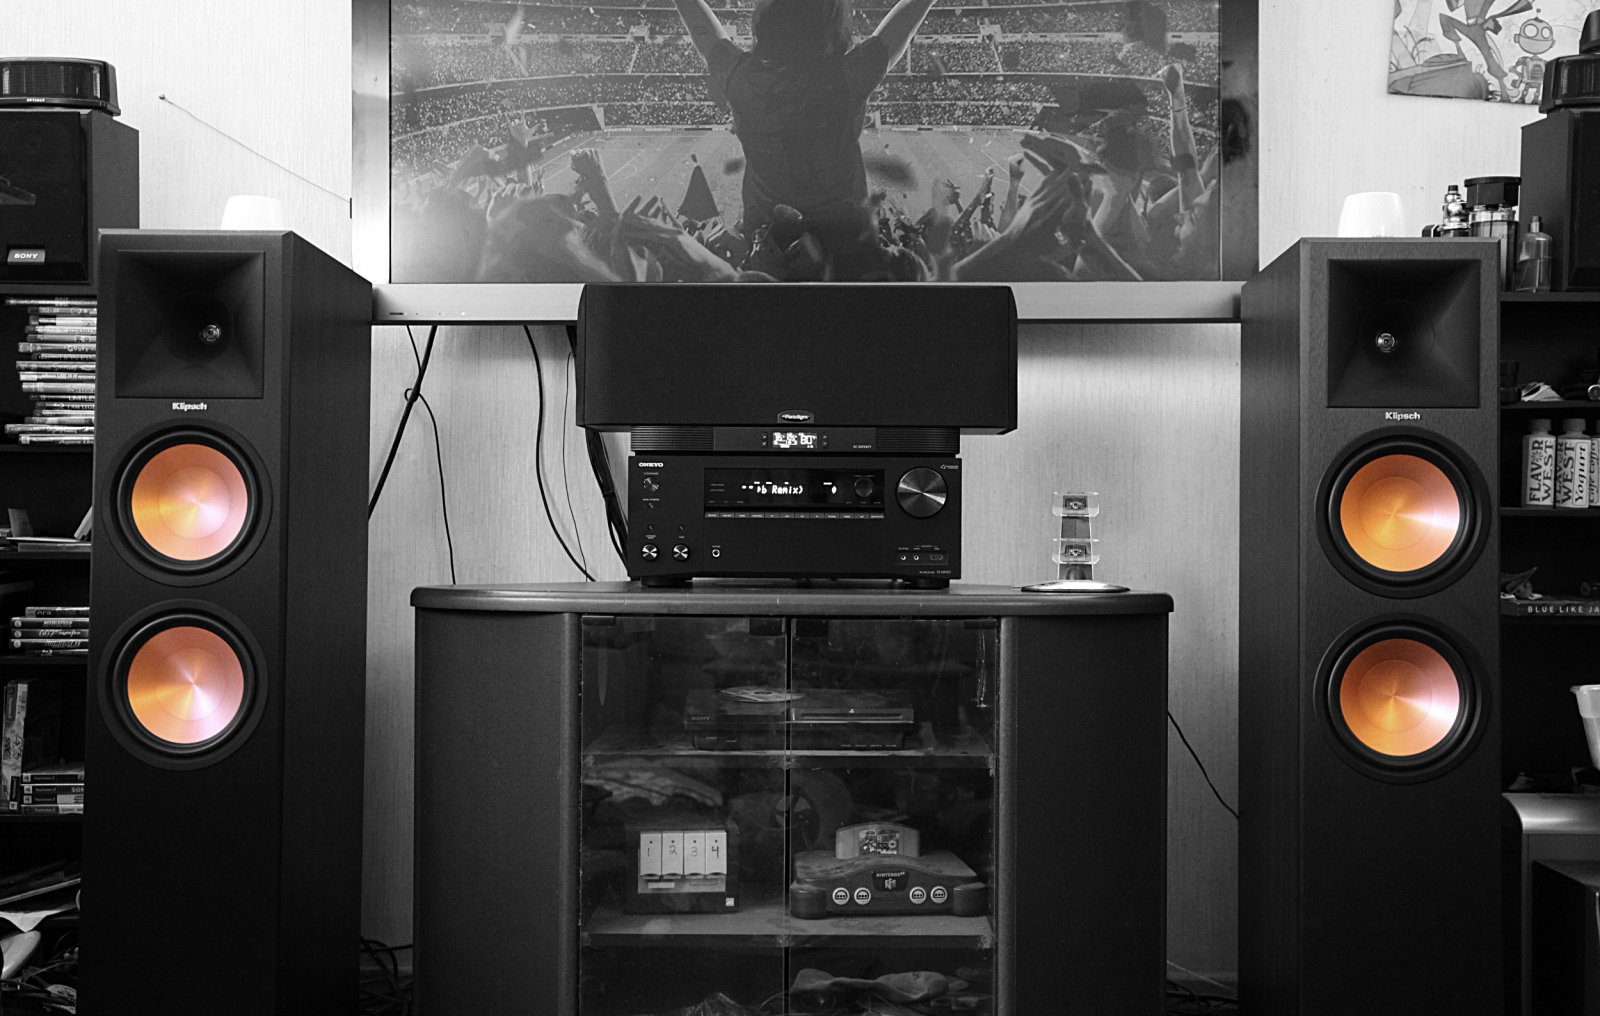 Complete setup